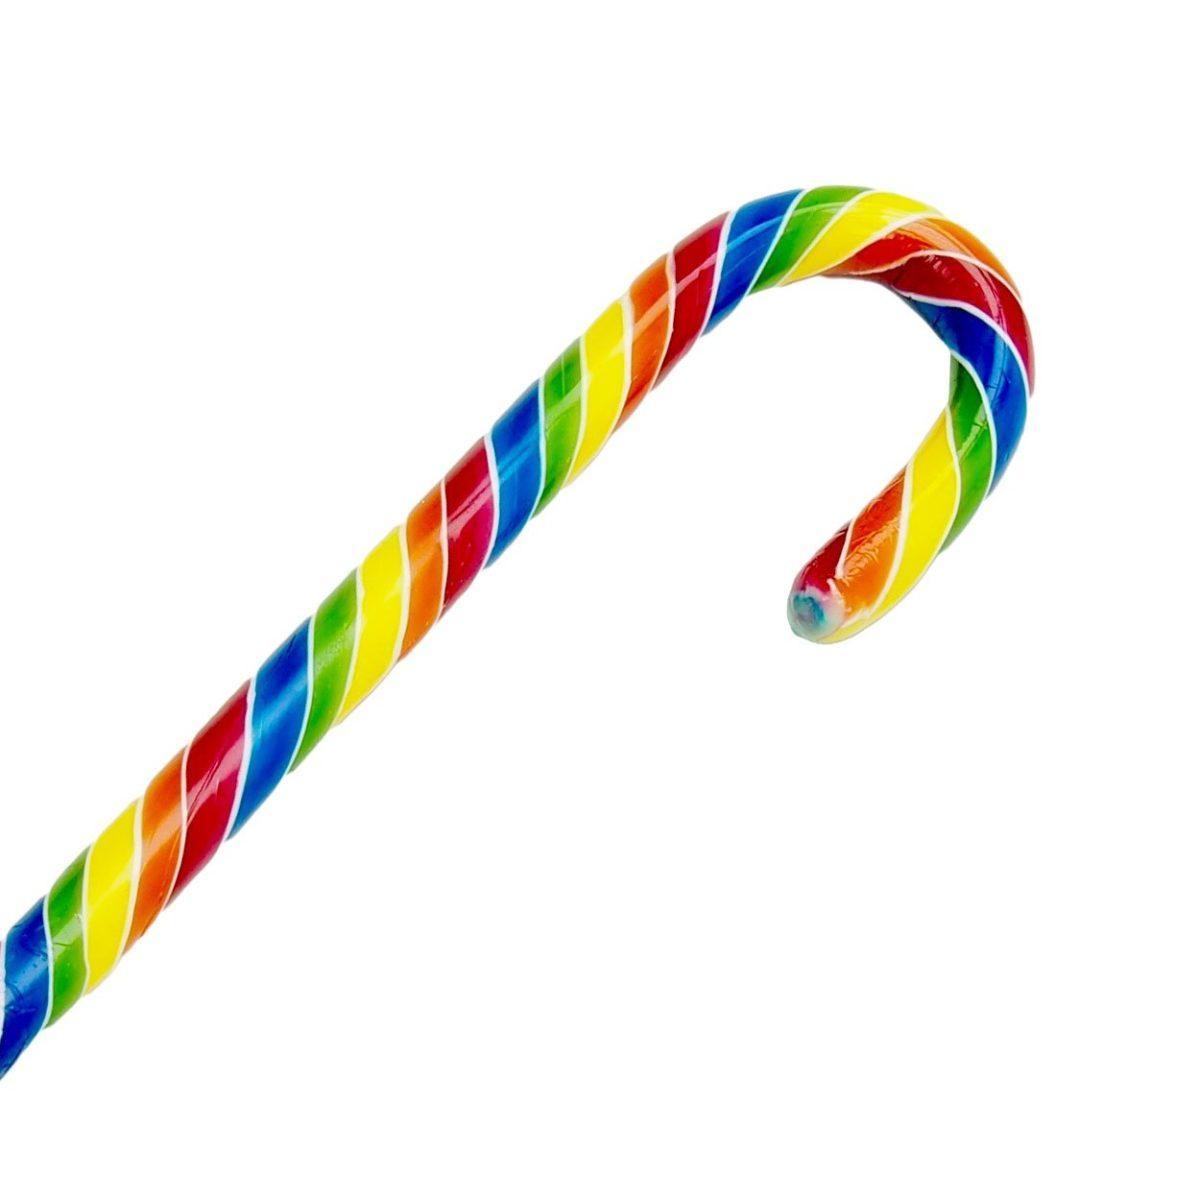 Zuckerstange Regenbogen (28g) 1